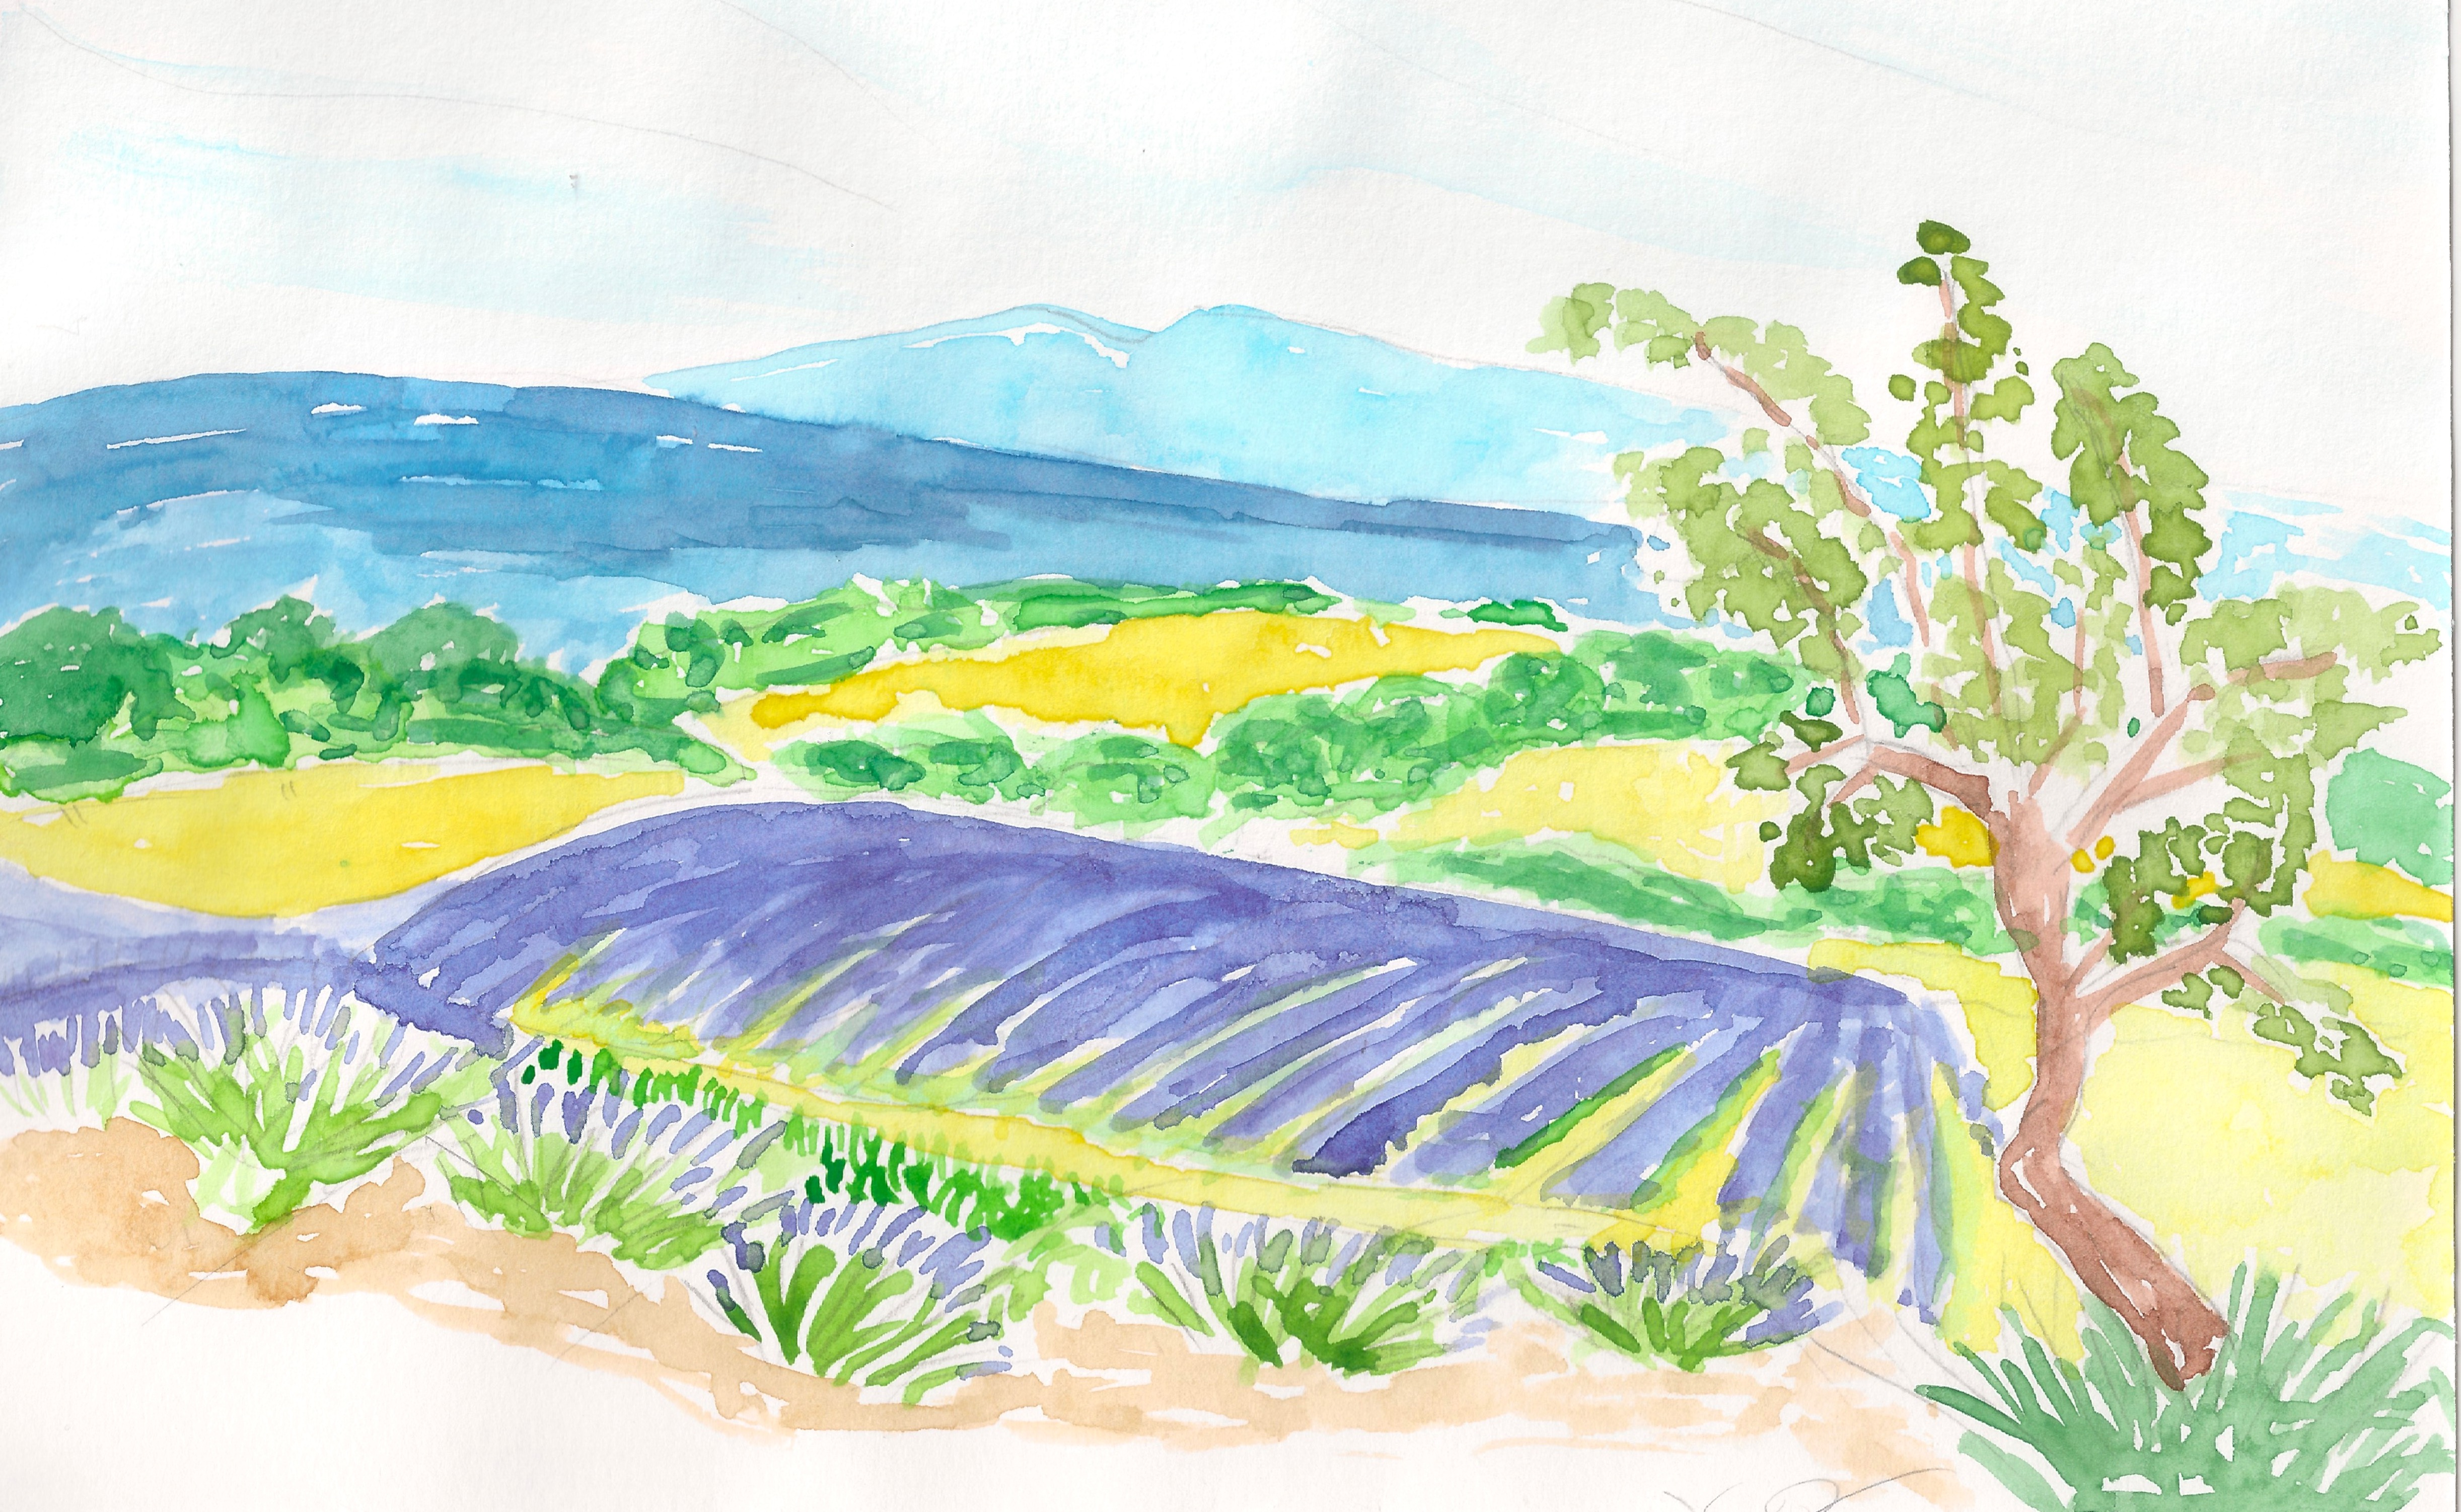 Dessin Drôme provençale de Totoro67